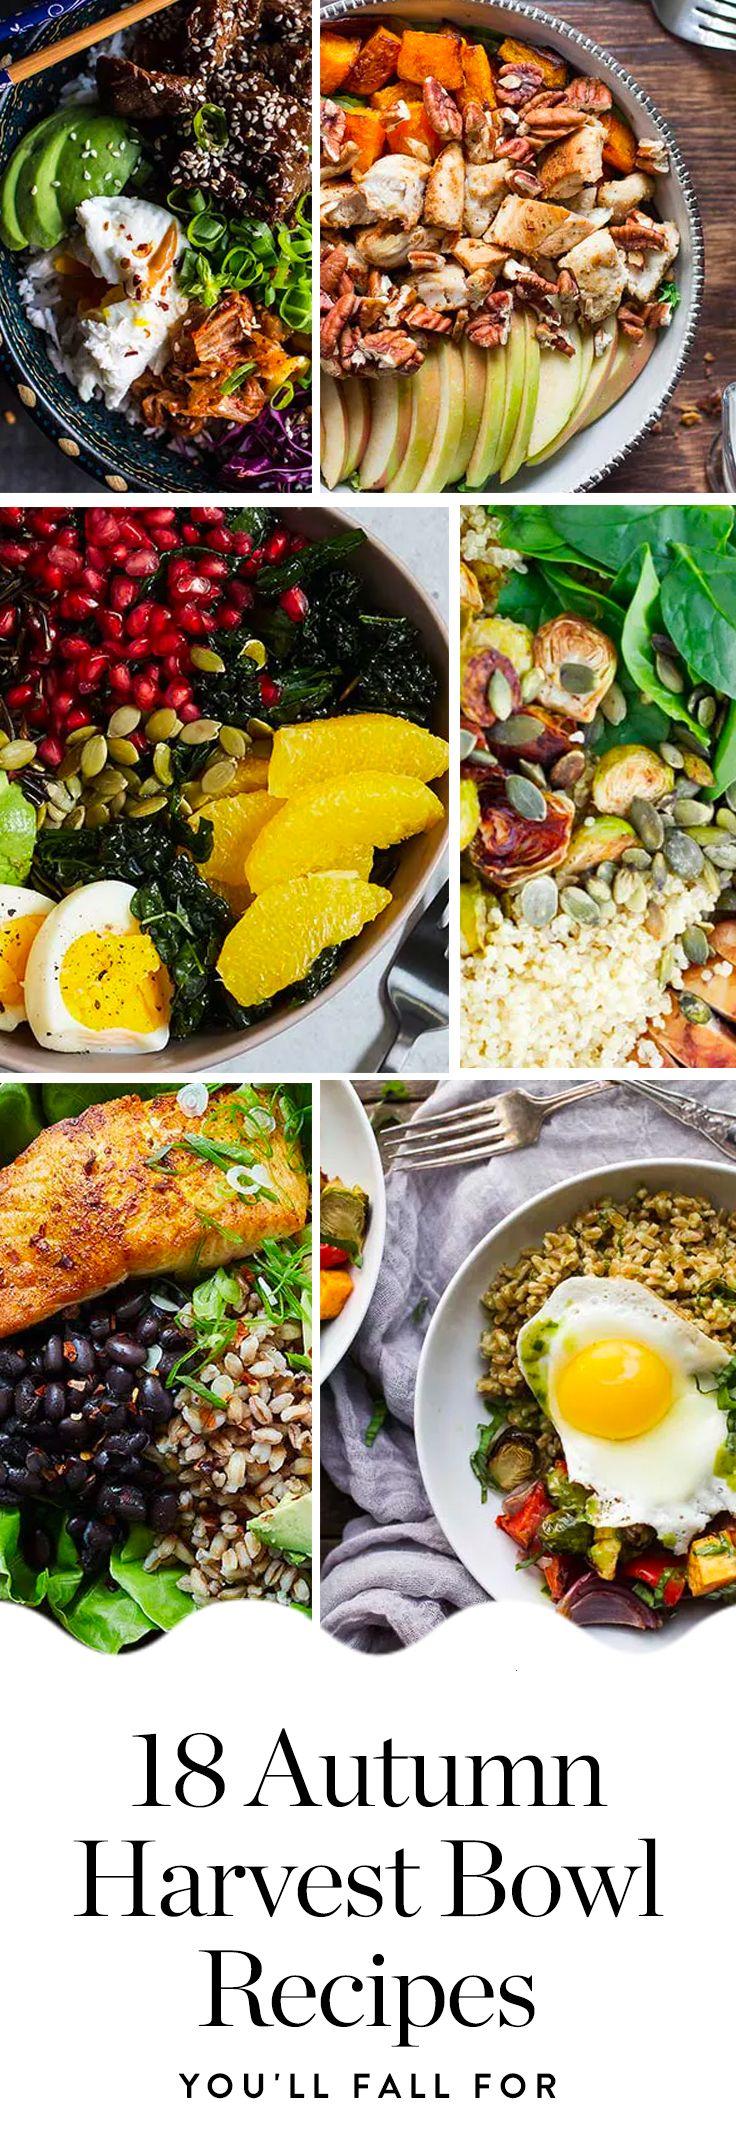 Here are 20 amazing autumn harvest bowl recipes you'll fall for. #fallrecipes #fall #recipes #harvestbowl #healthyrecipes